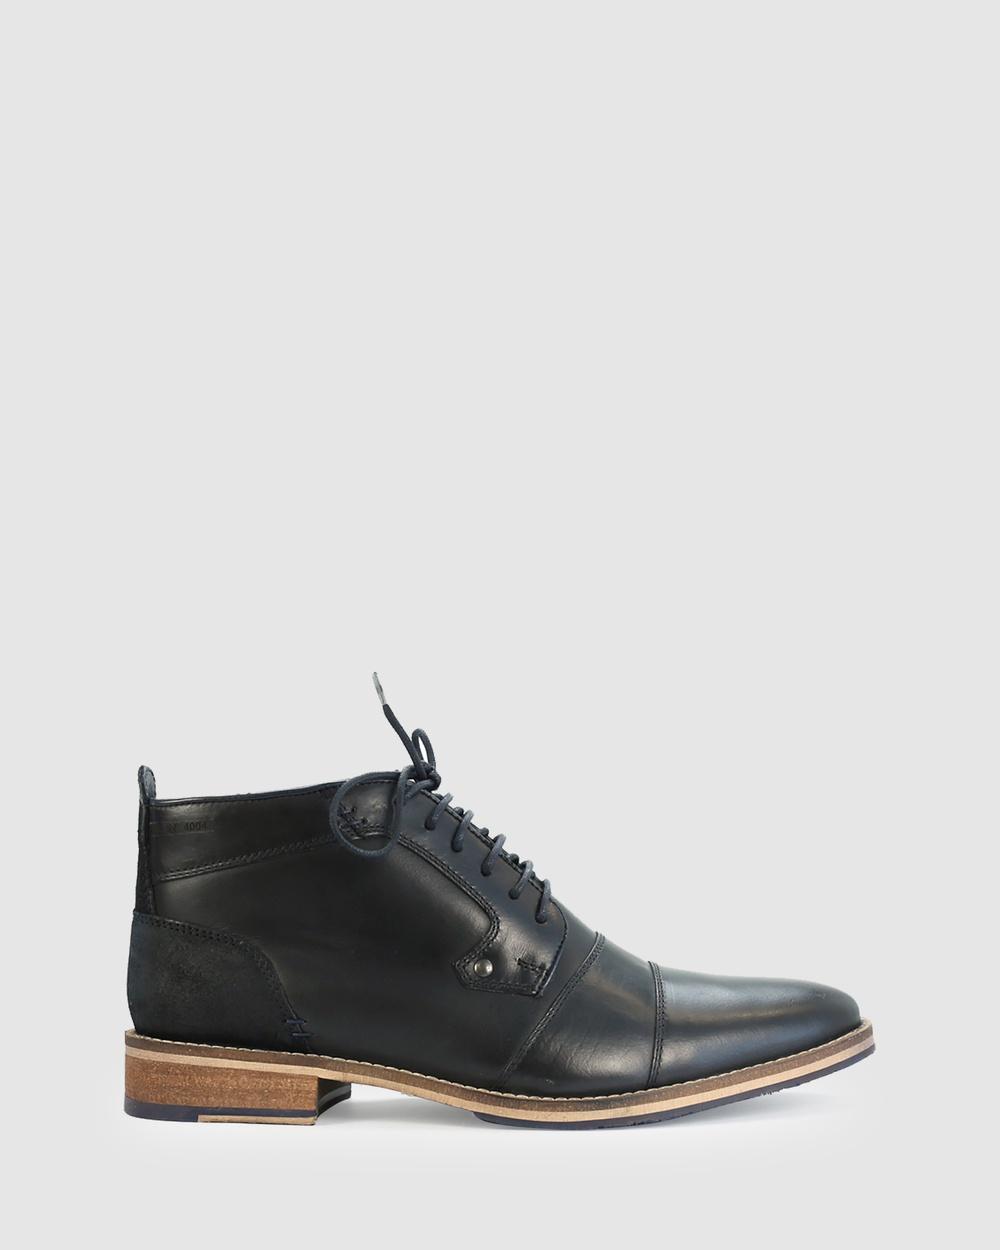 Acton Ali Boots Black